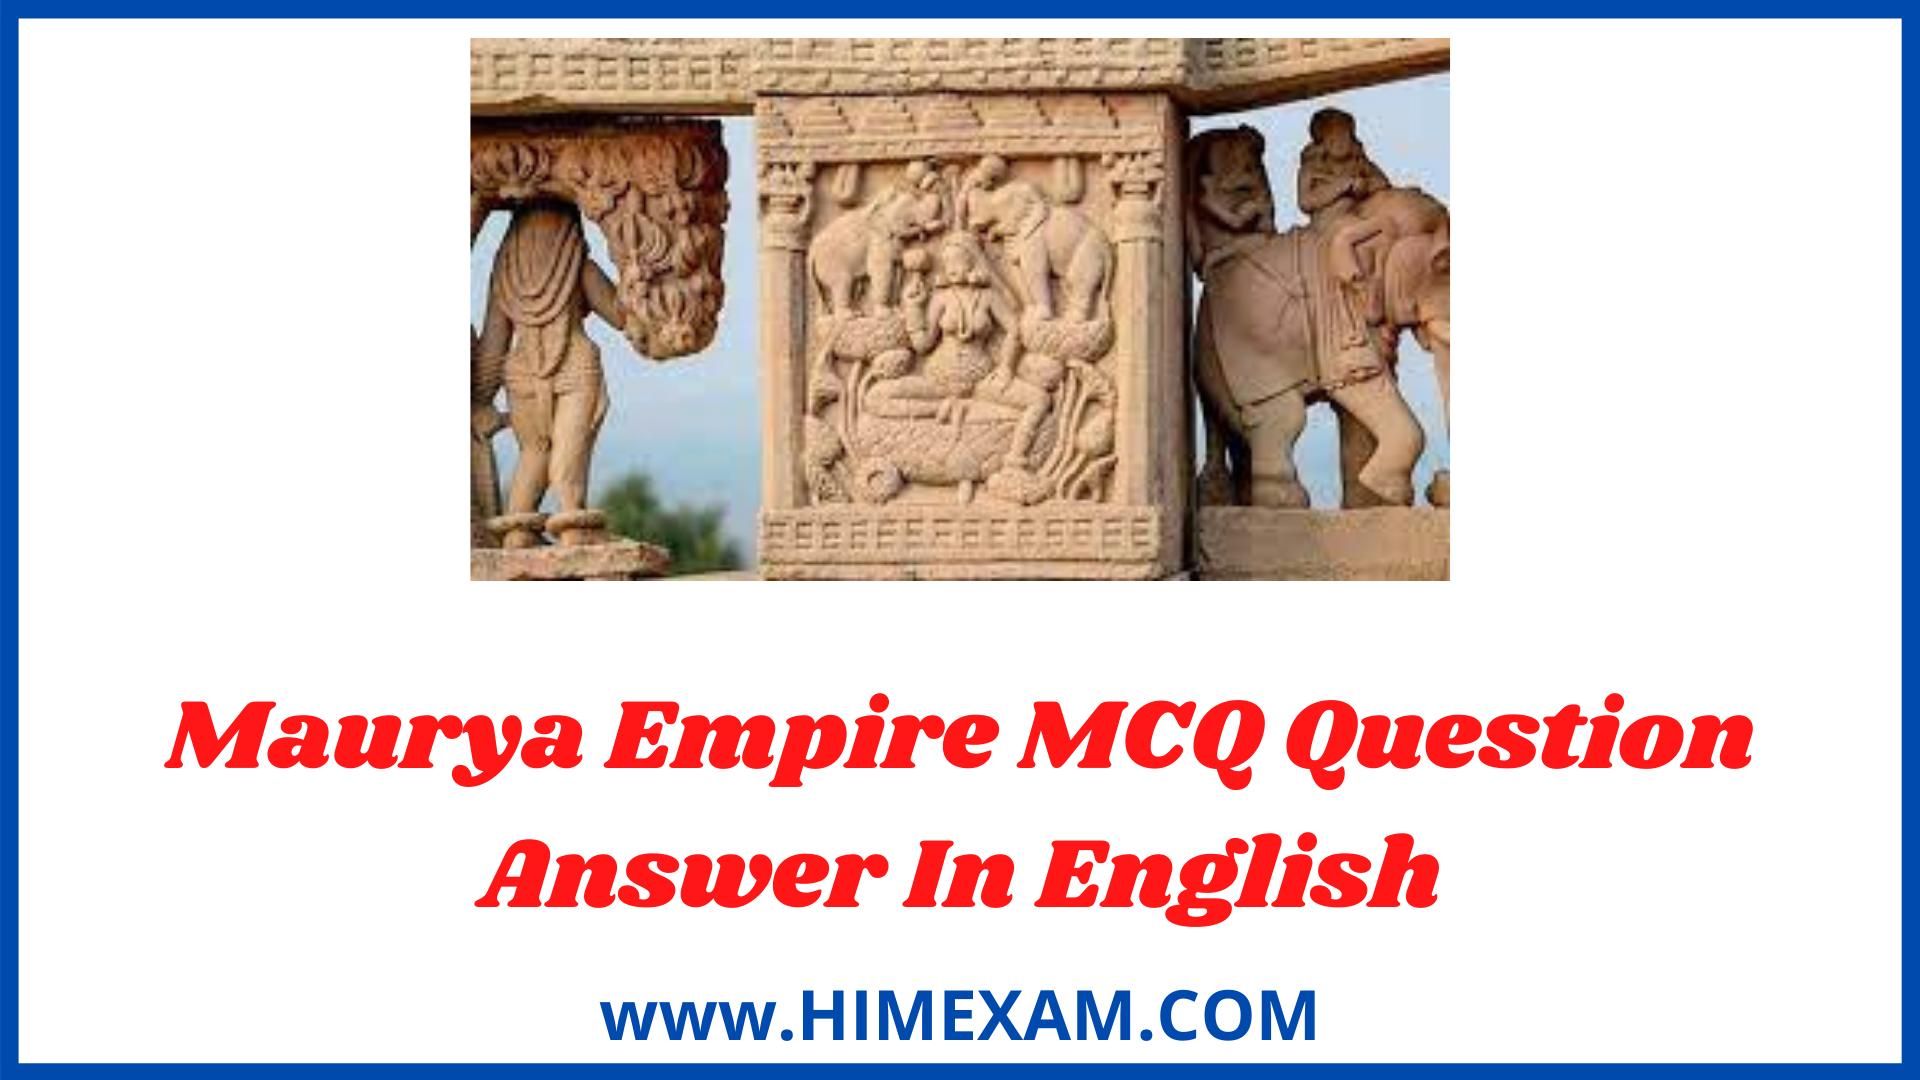 Maurya Empire MCQ Question Answer In English